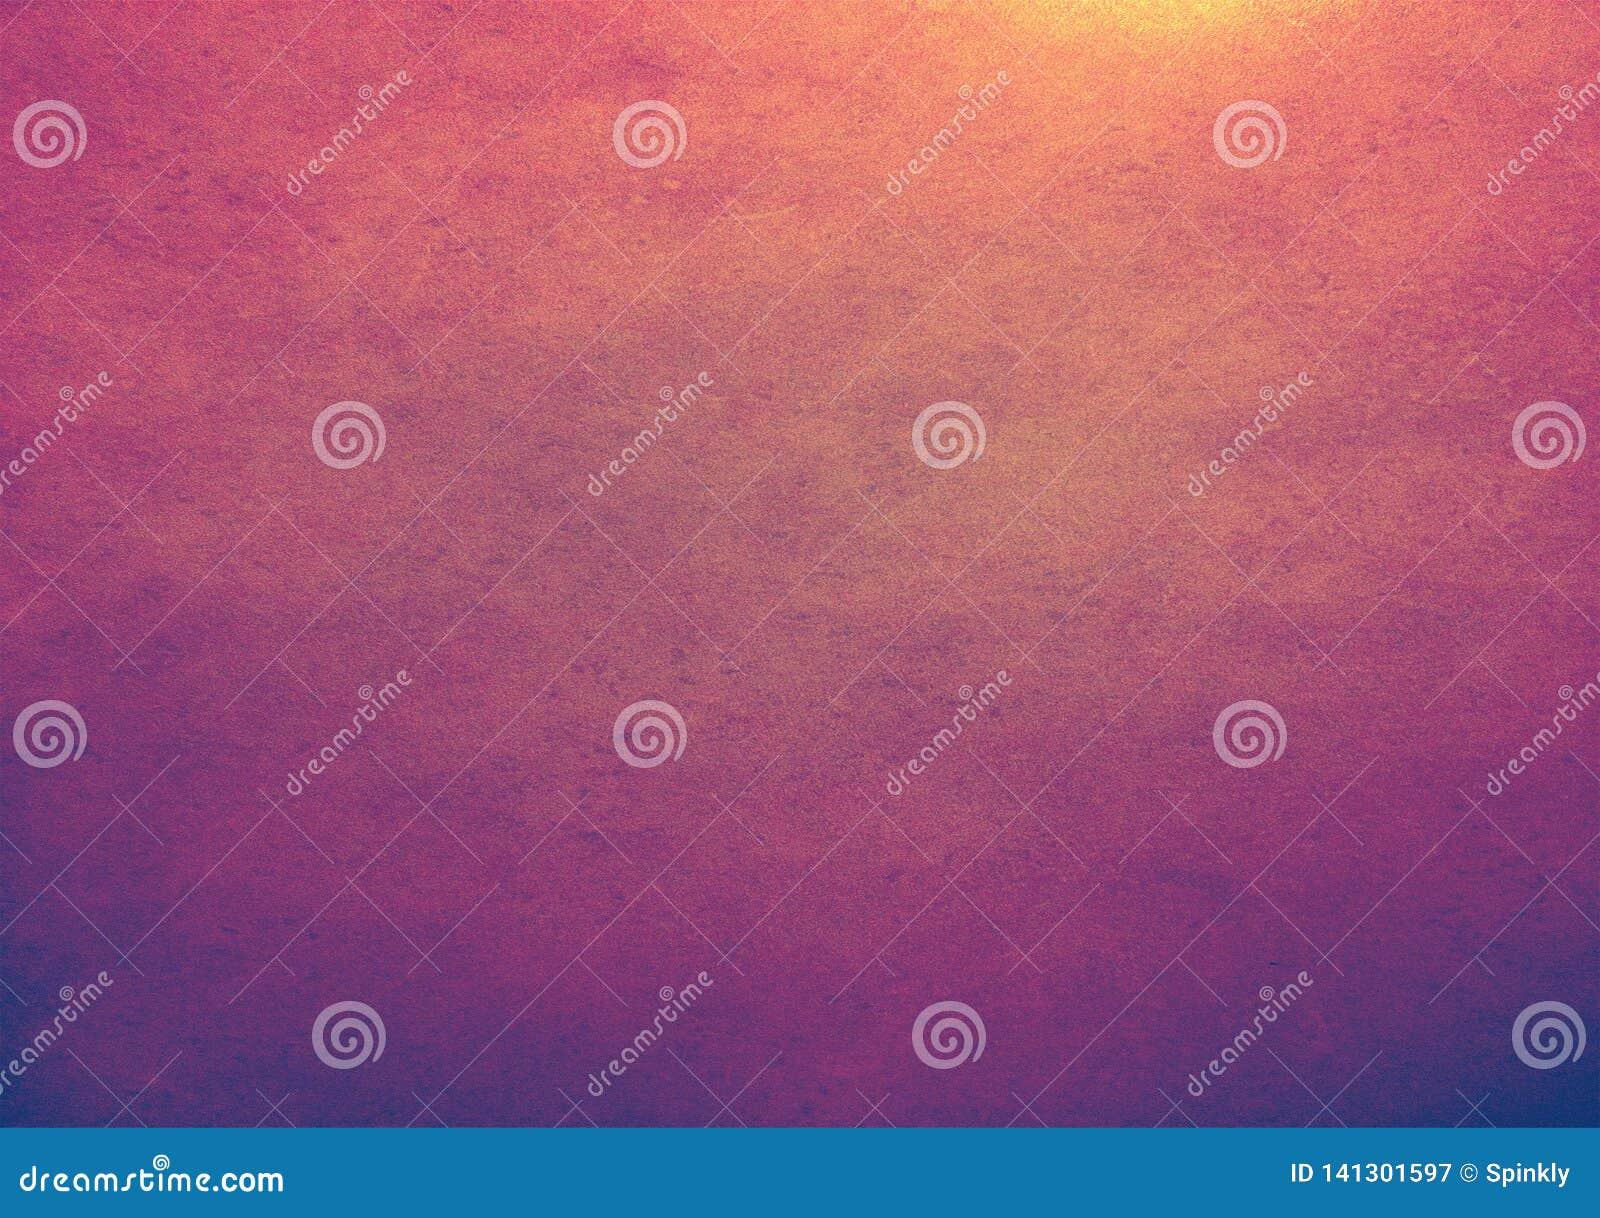 Colored textured gradient wallpaper background design